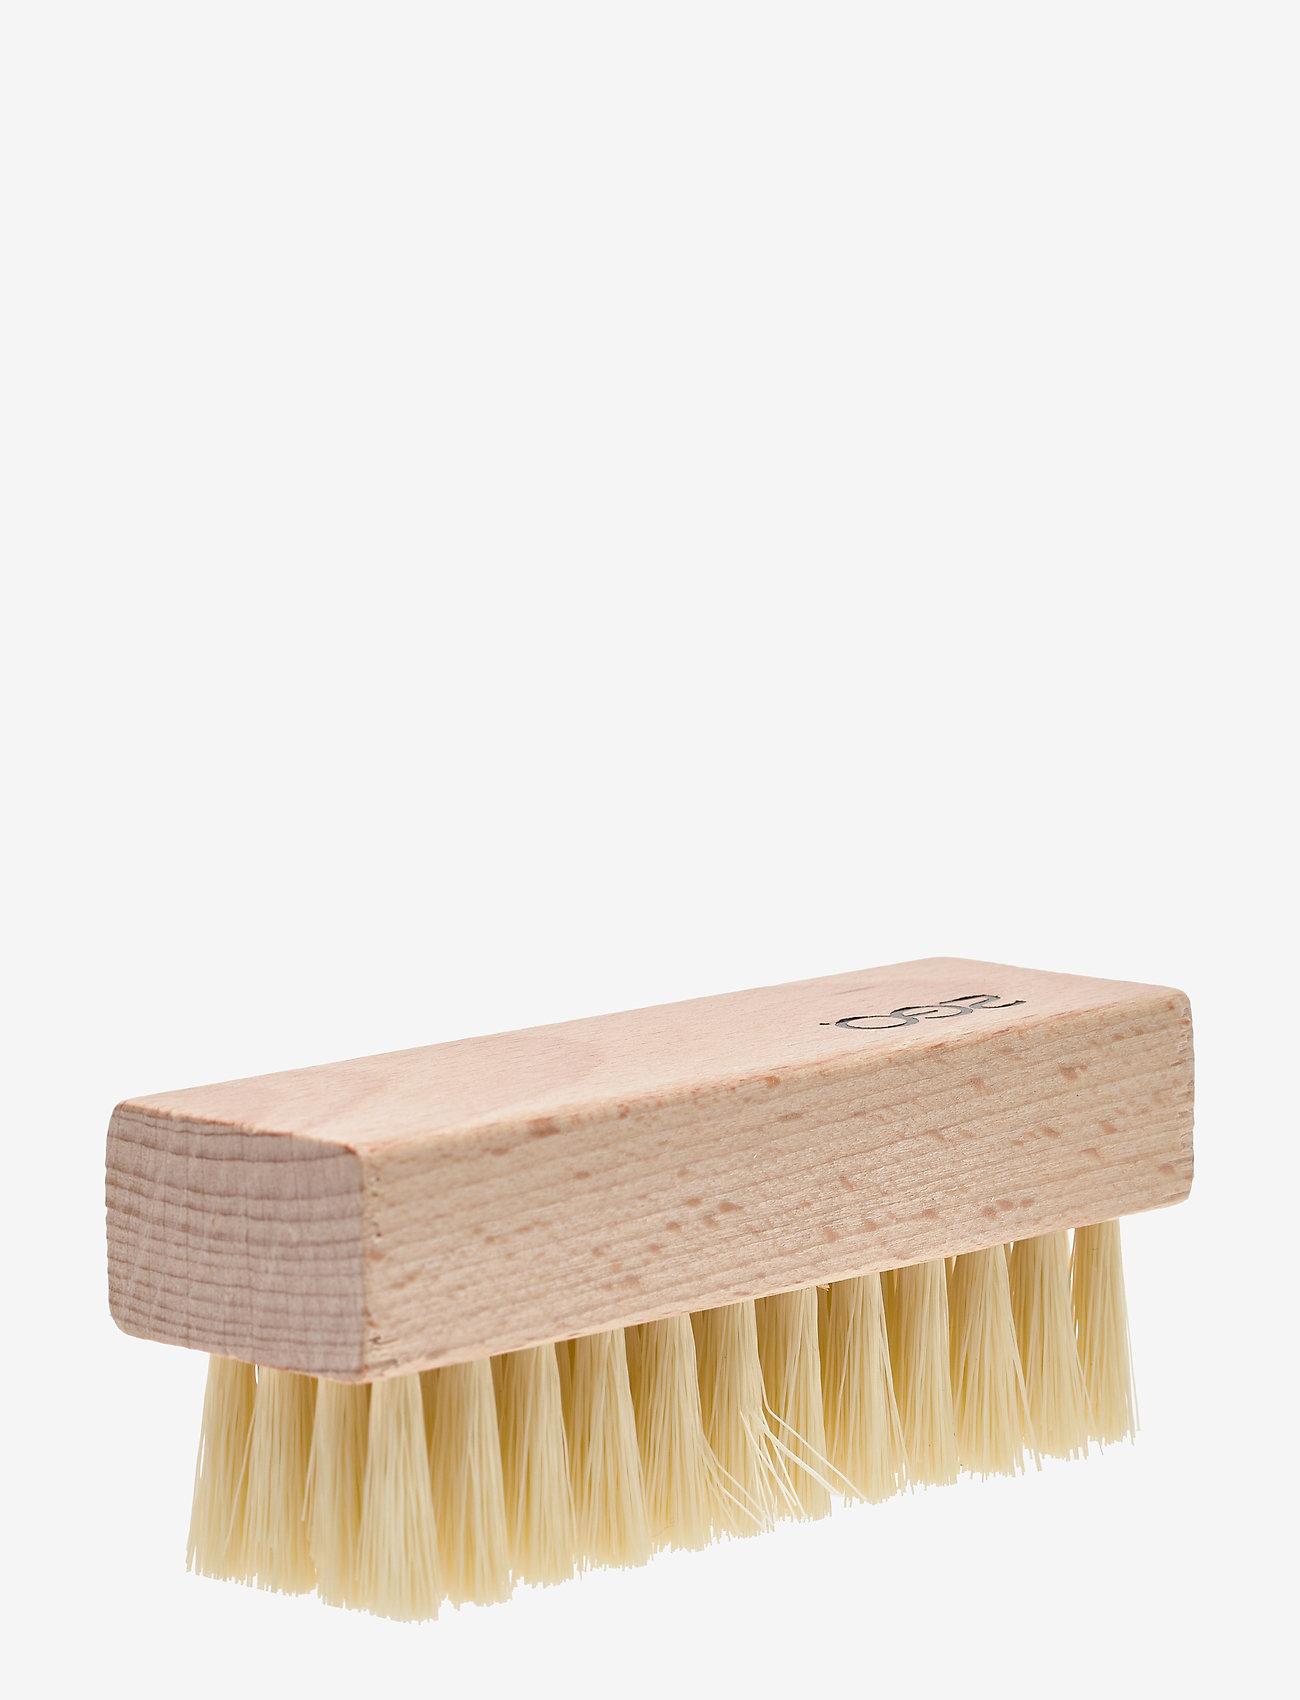 2GO - 2GO Cleaning brush - schuhschutz - beige - 0